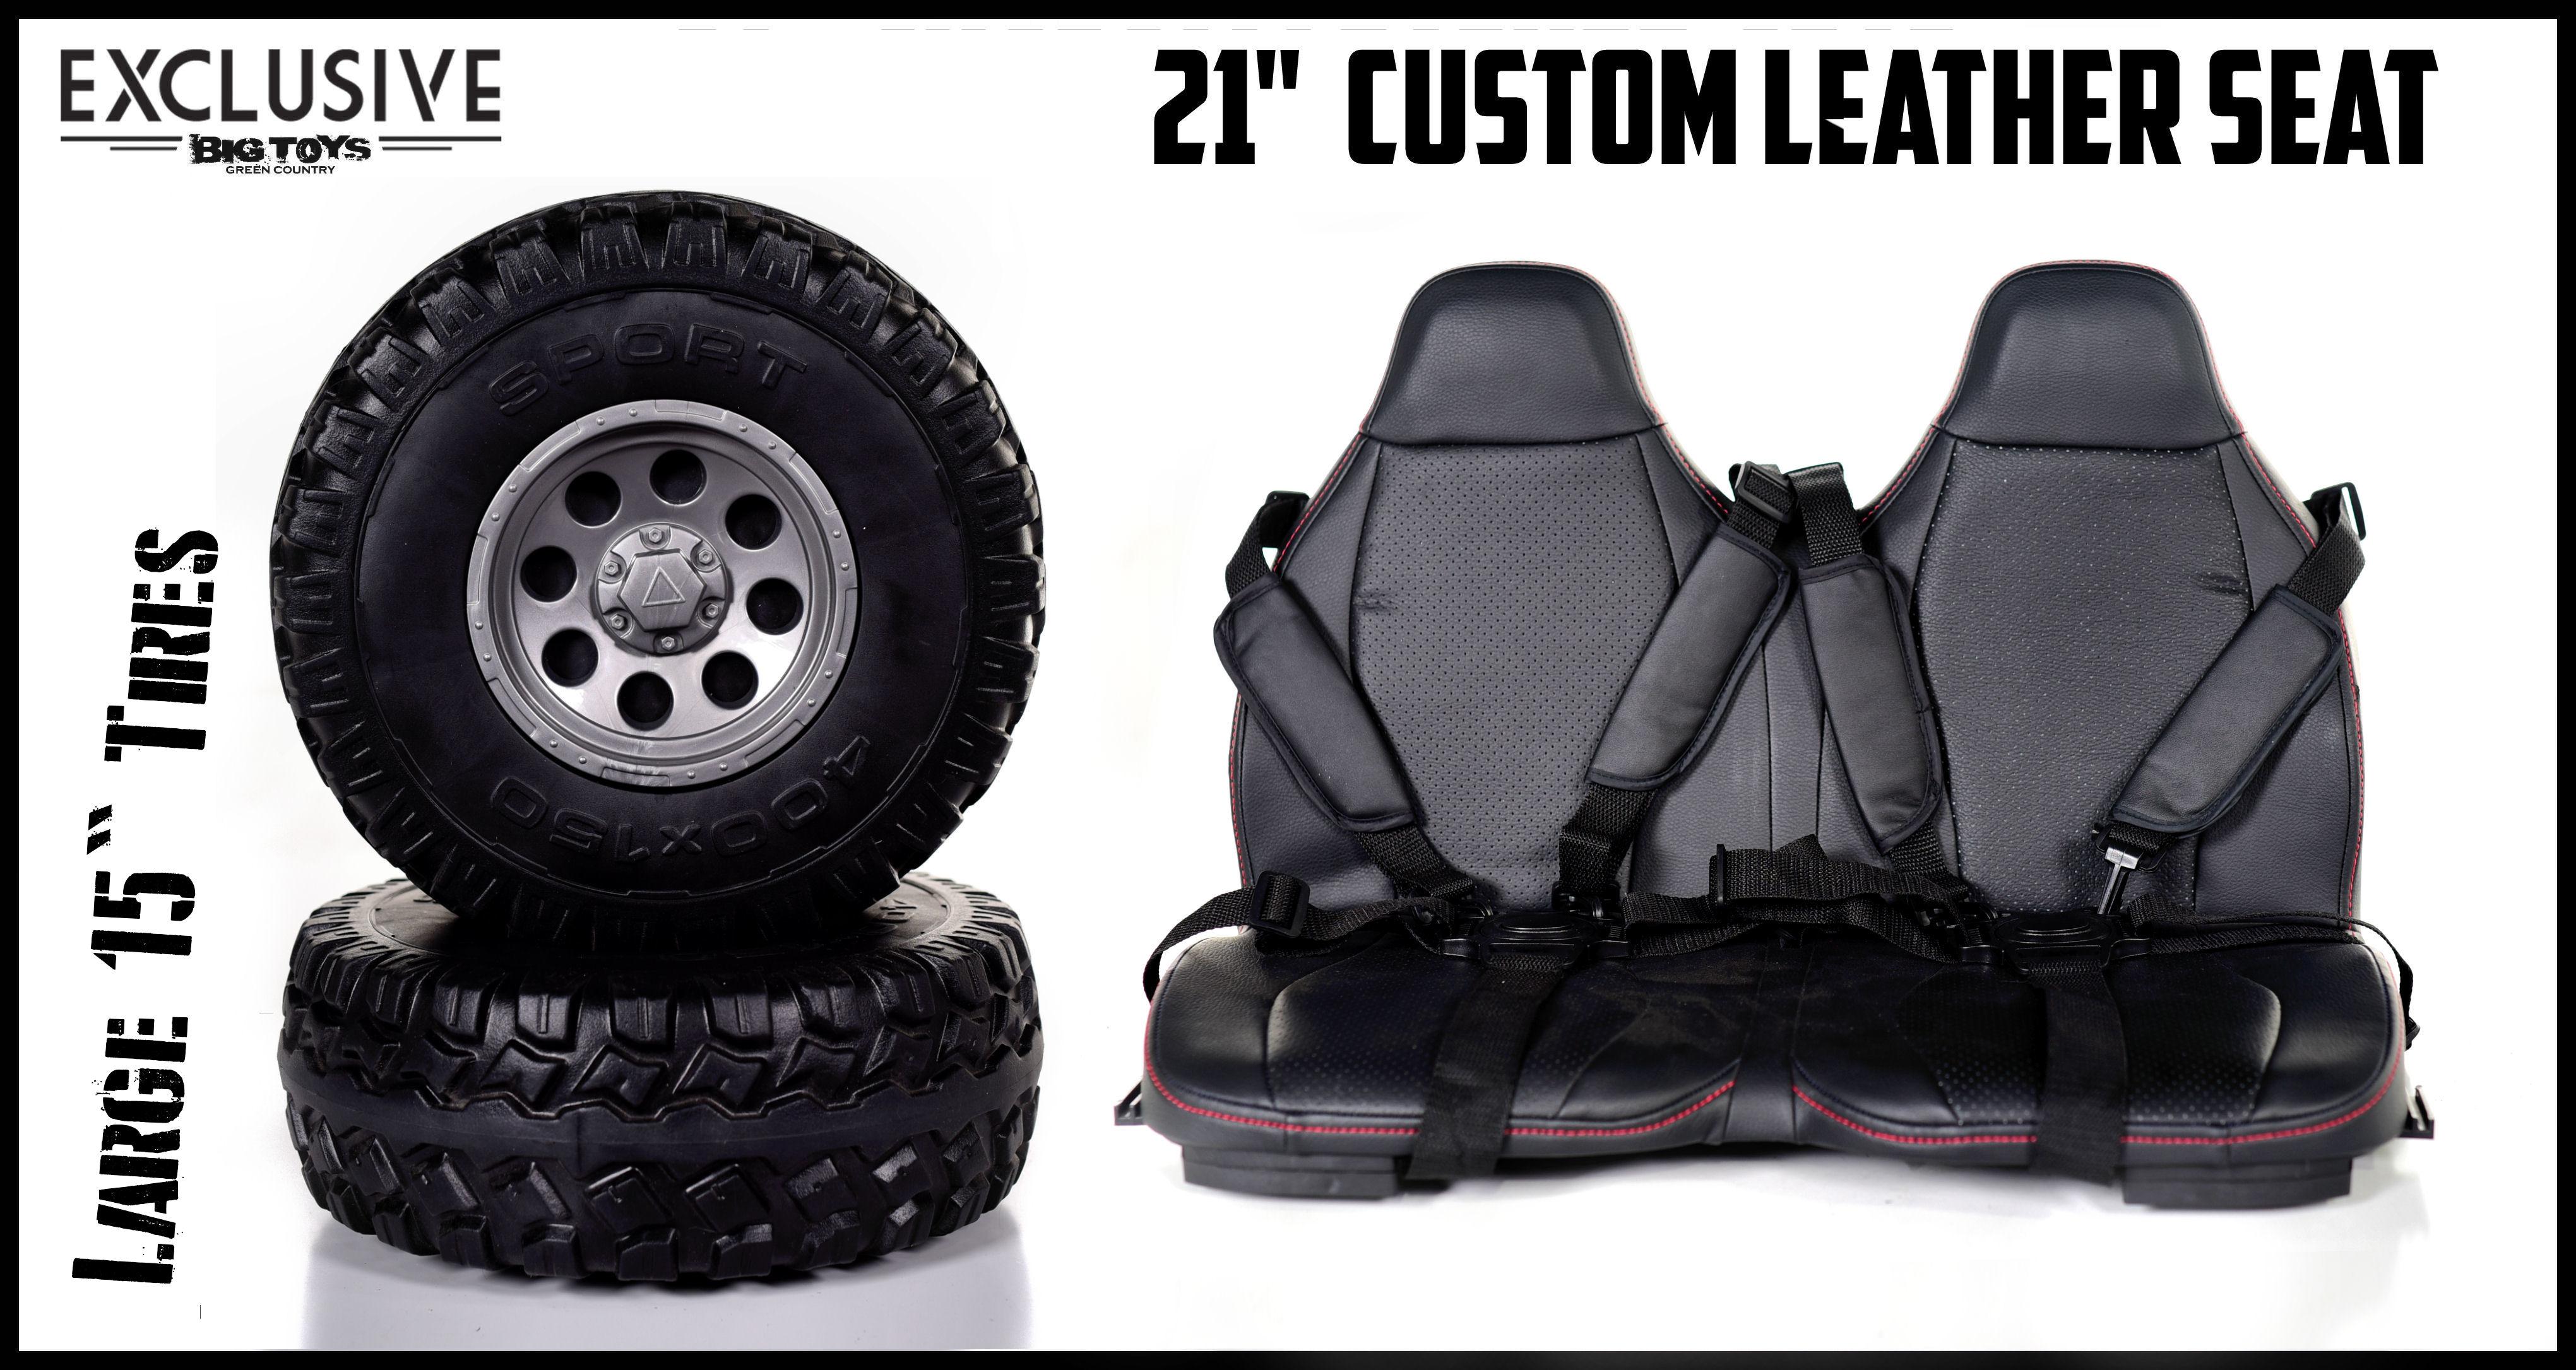 challenger-seat-tires.jpg